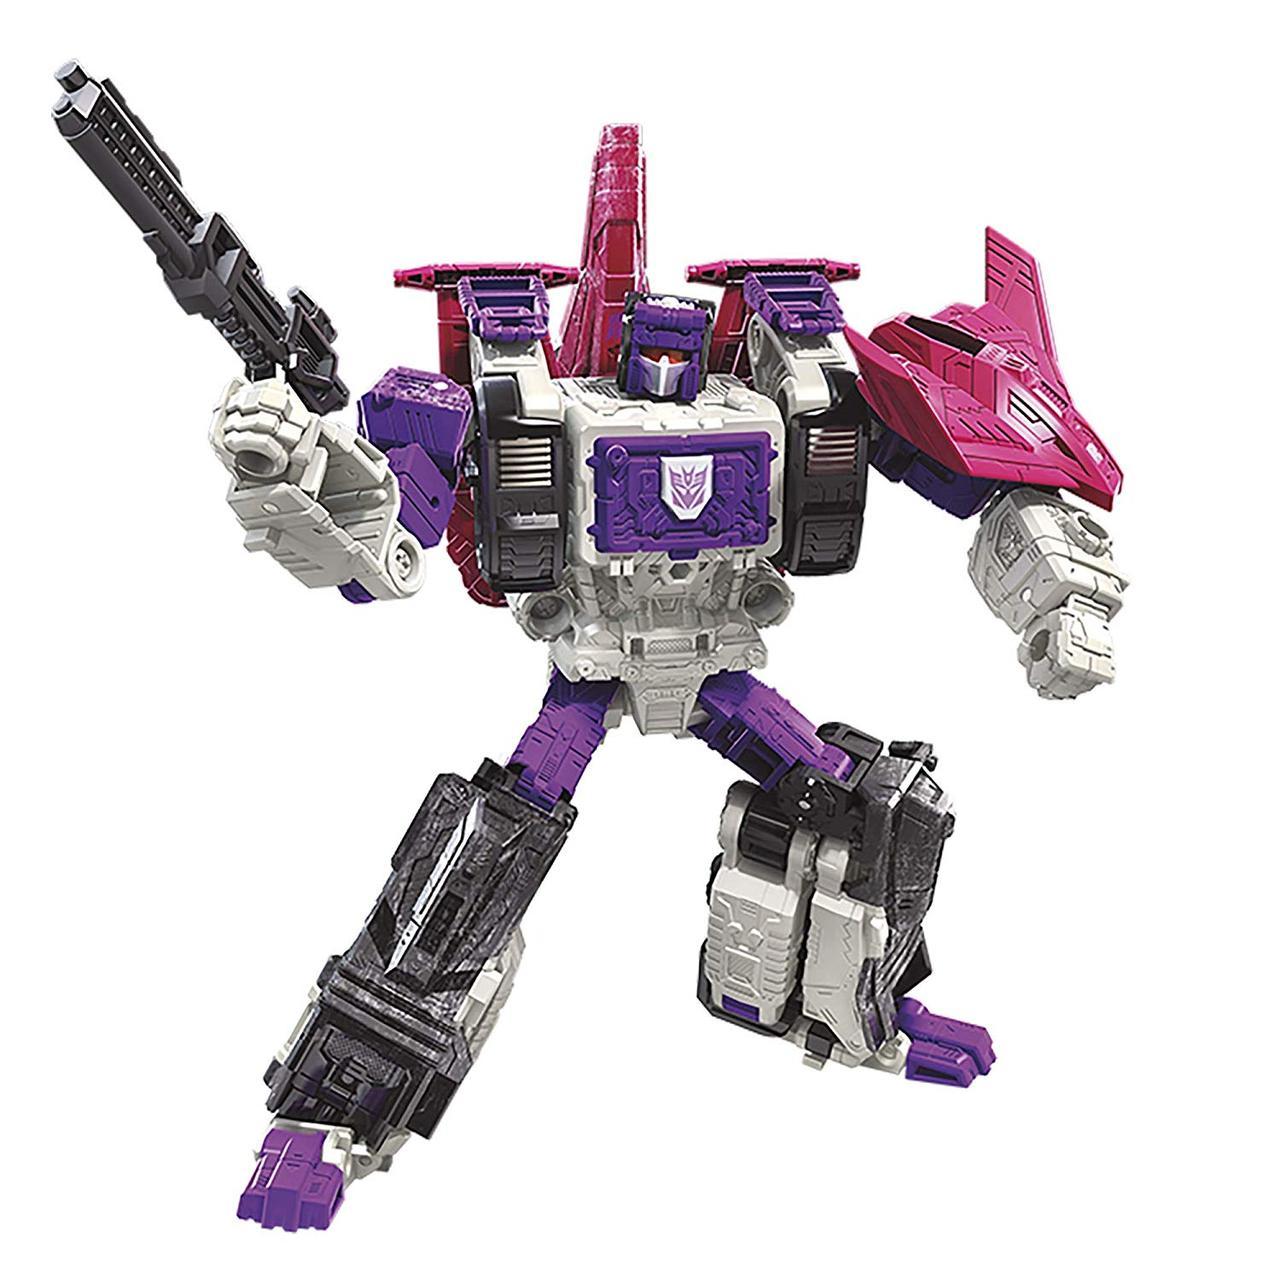 Transformers Трансформер колекційний Конструктікон Скрепметал 14 см Studio Series 41 Deluxe Scrapmetal